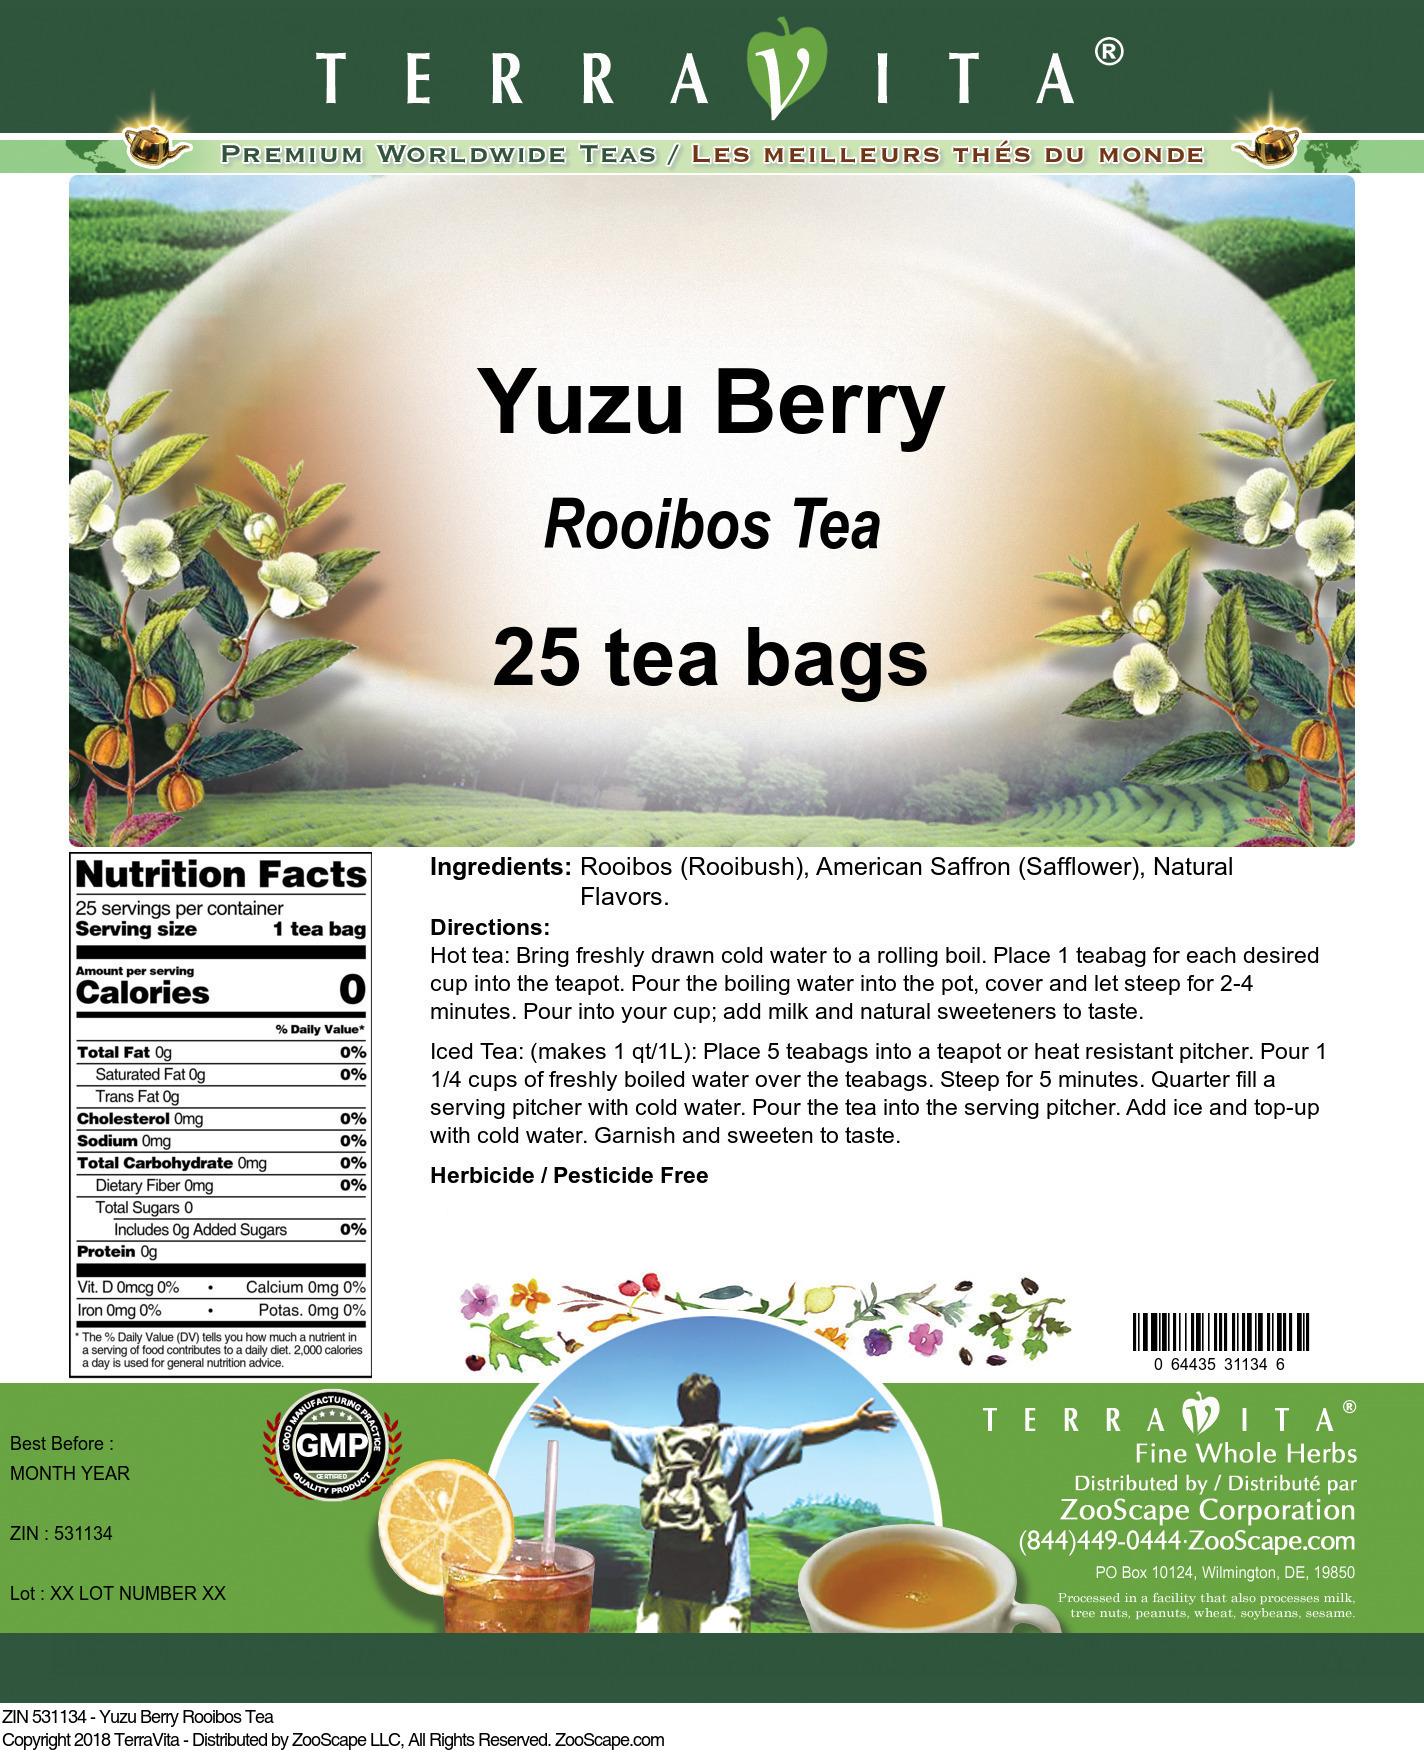 Yuzu Berry Rooibos Tea